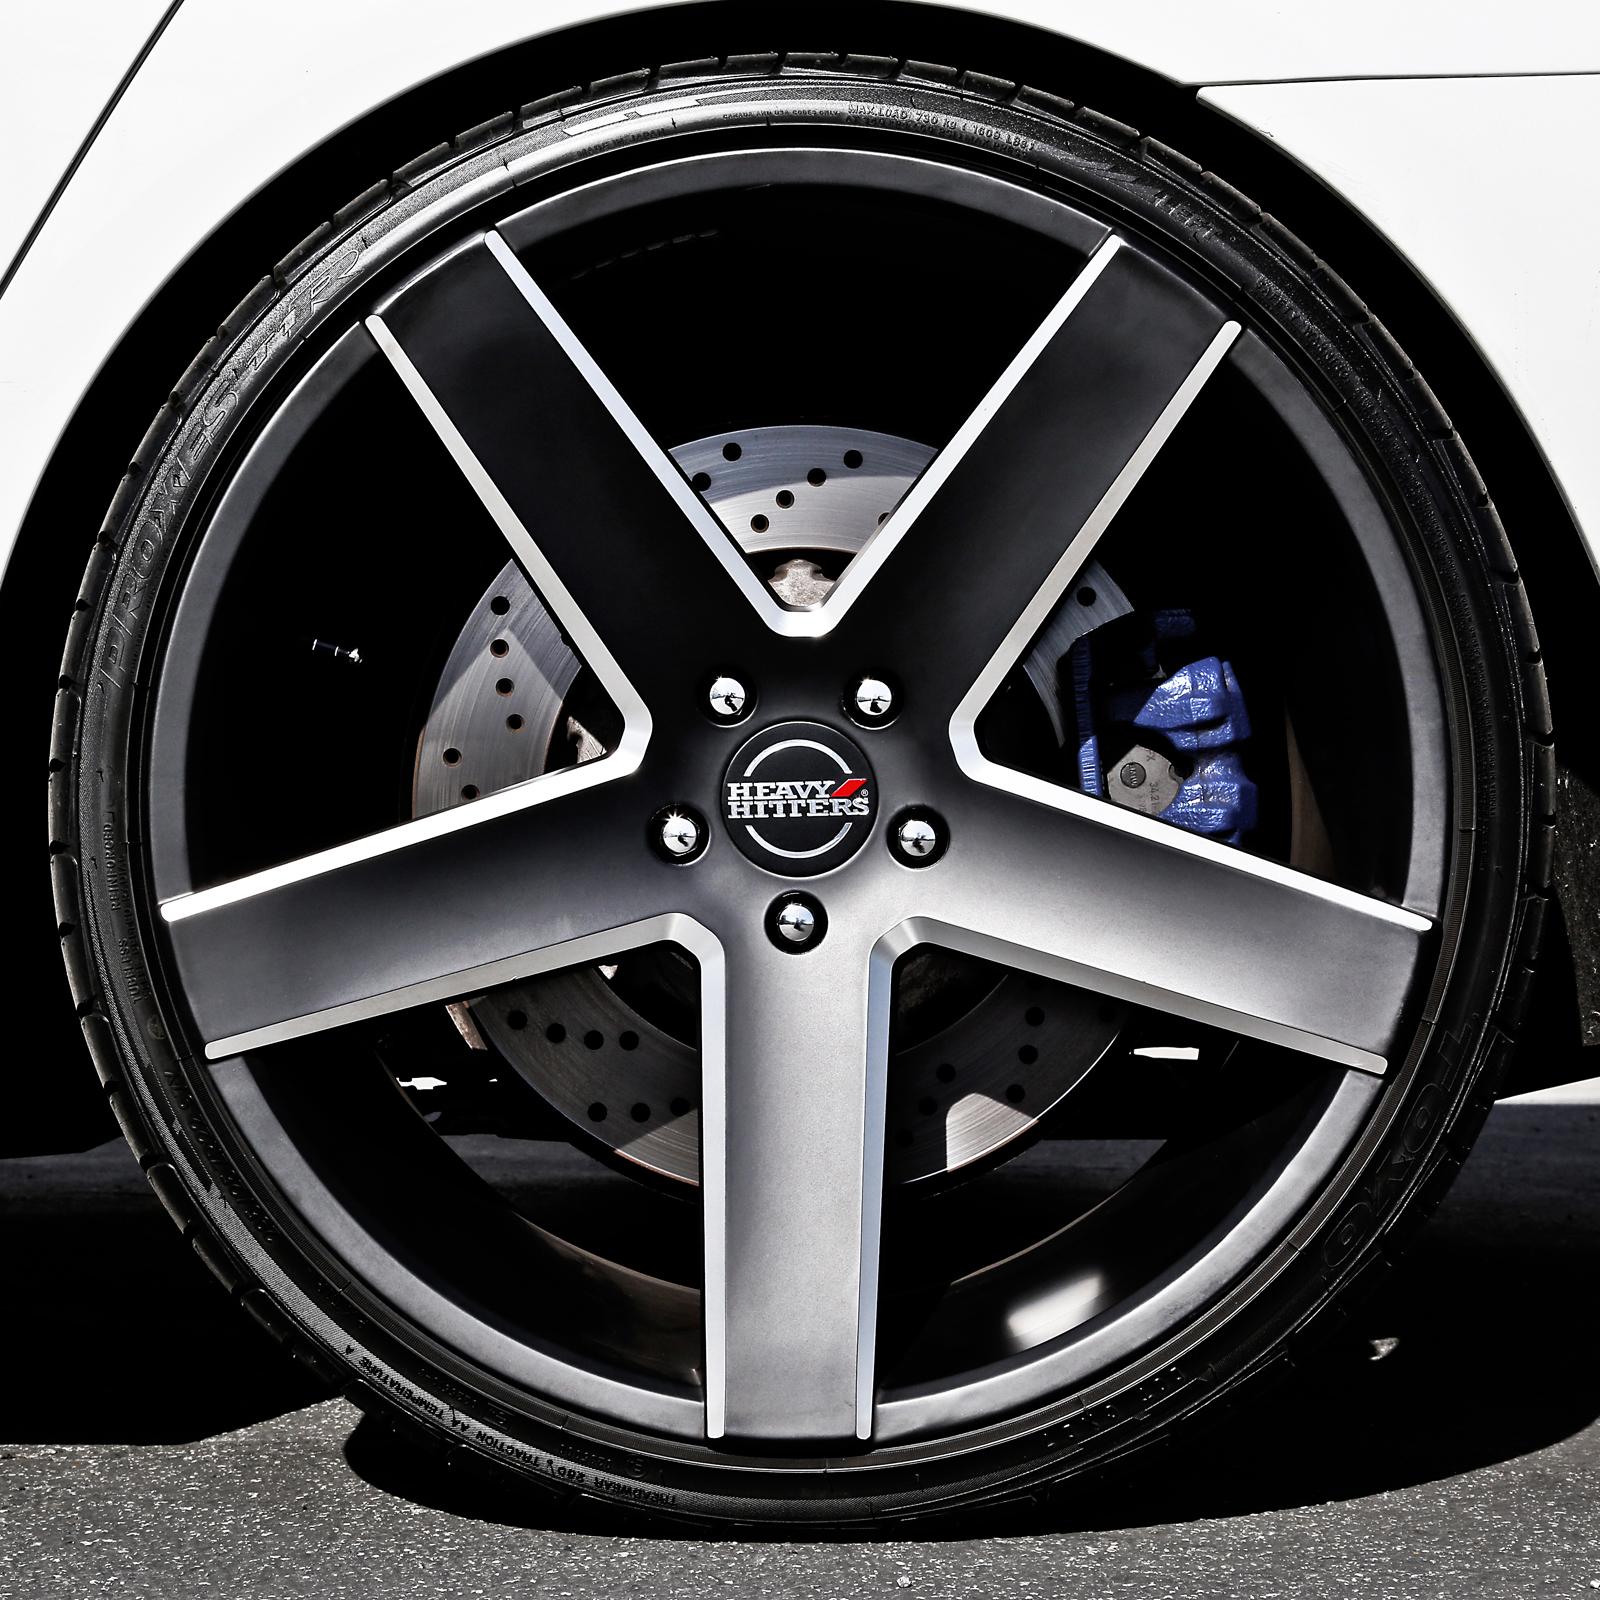 BMW M6 Gran Coupe >> 2014 BMW M6 Gran Coupe – HH15 | Heavy Hitter Wheels